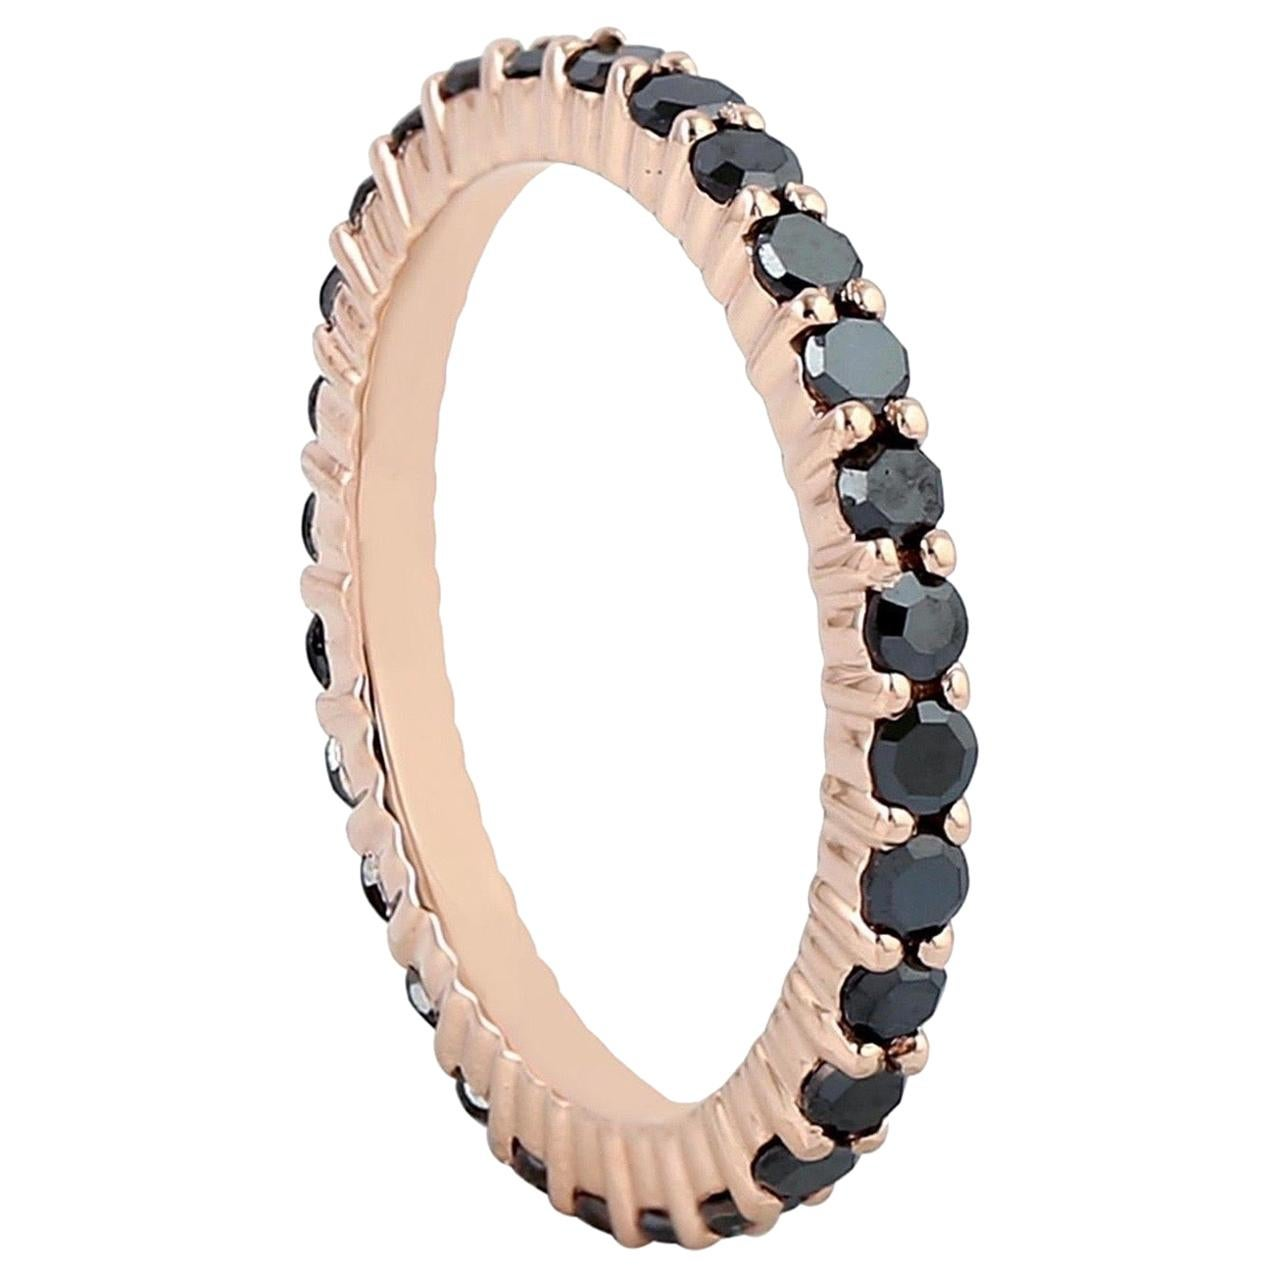 Black Diamond 18 Karat Gold Eternity Ring